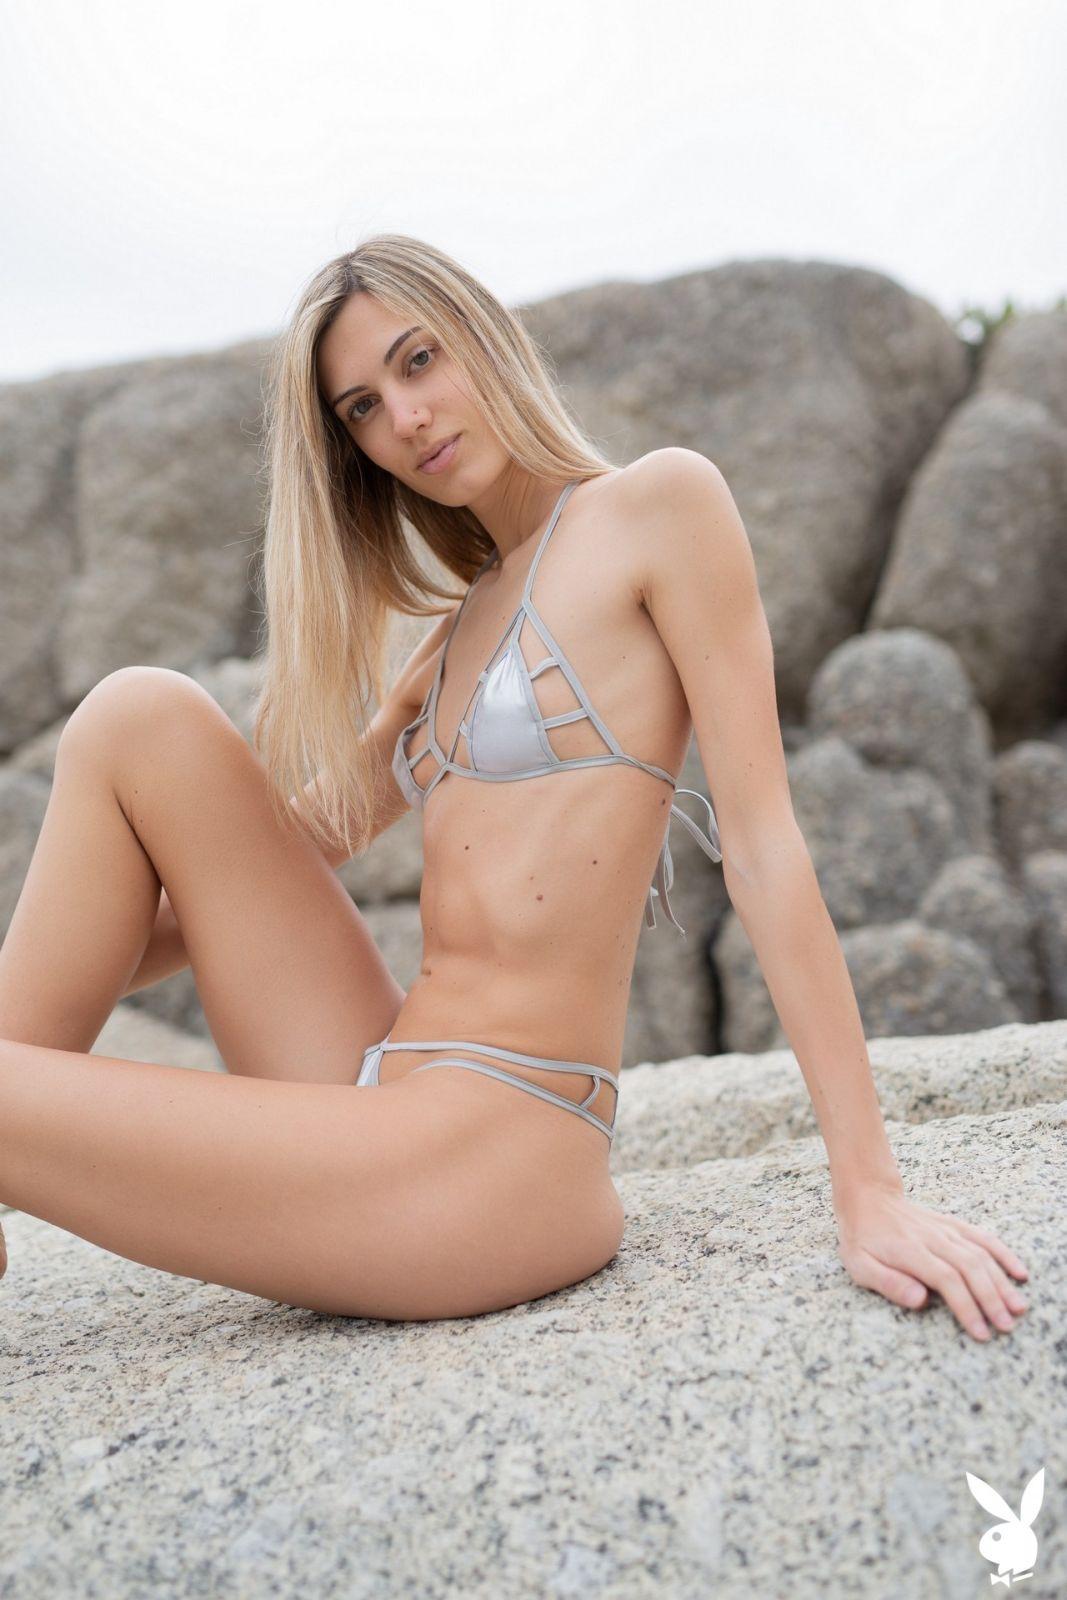 naturist beaches booty squat poses